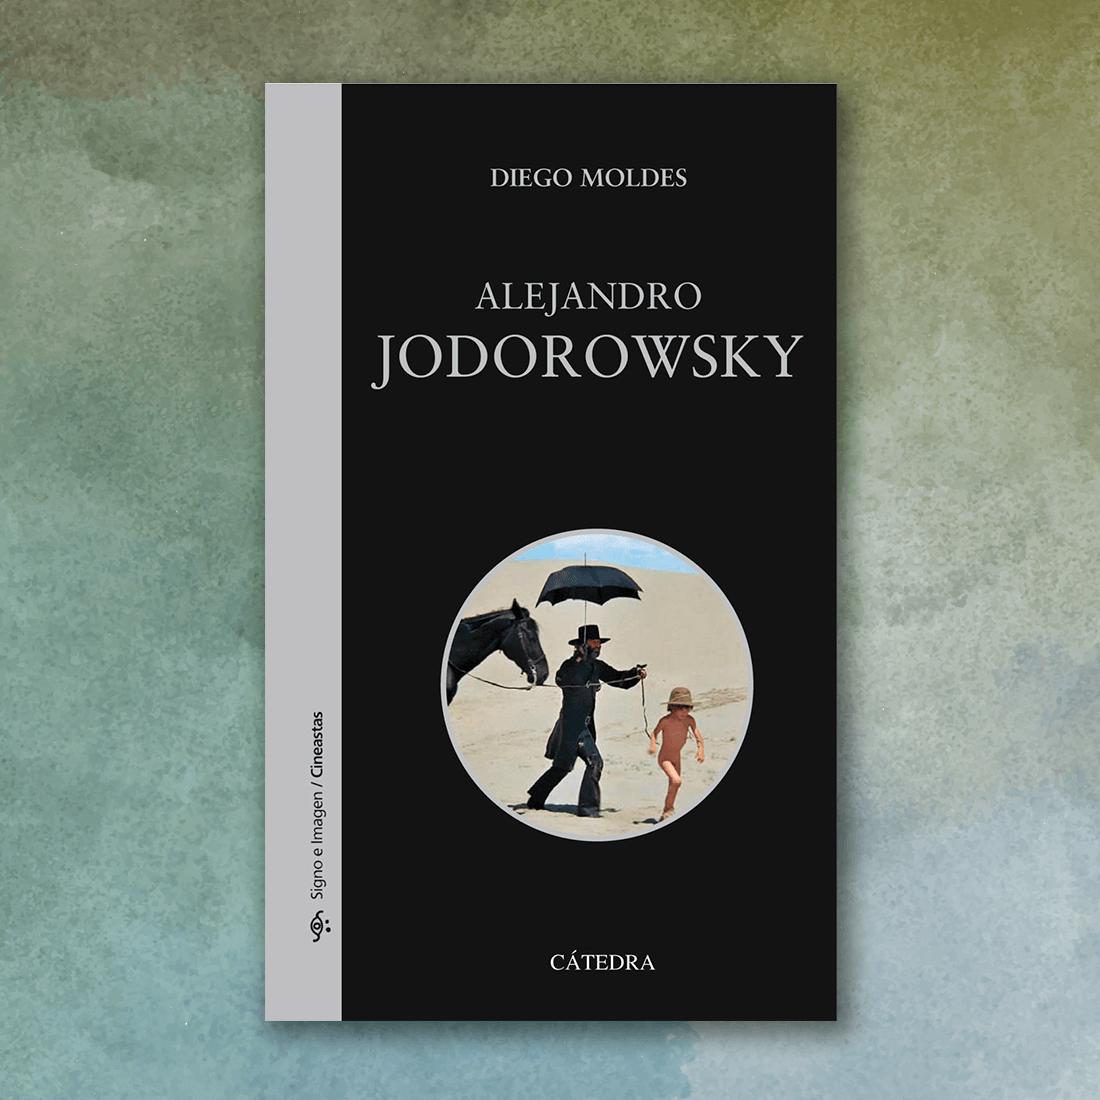 Alejandro Jodorowsky - Diego Moldes